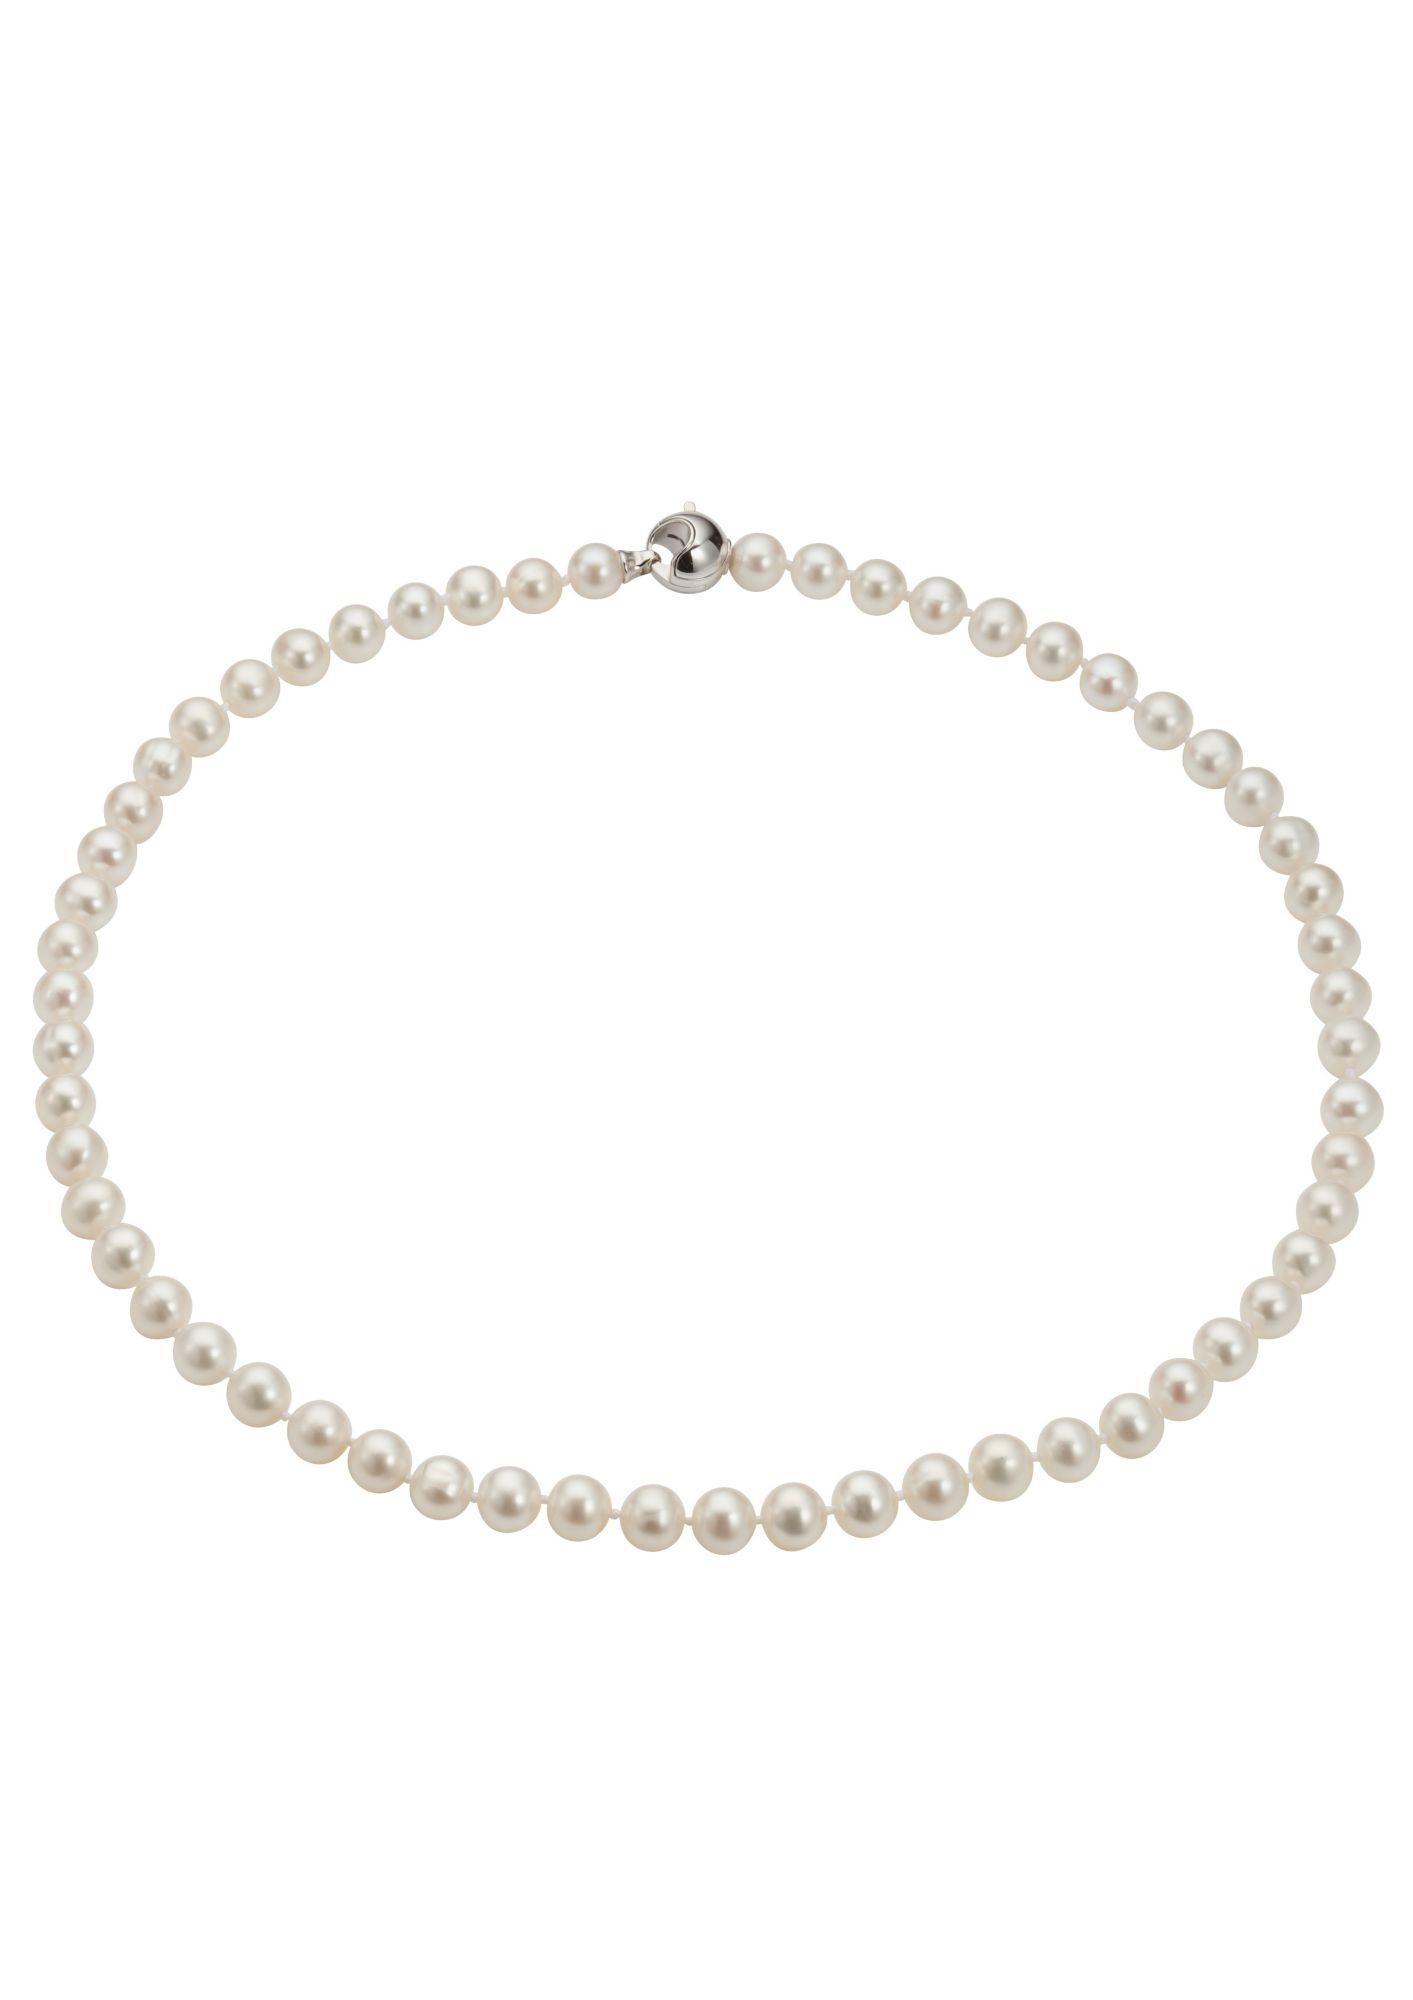 ADRIANA Adriana Perlenkette, »La mia perla A2839-KSW70-SIR/Ba«